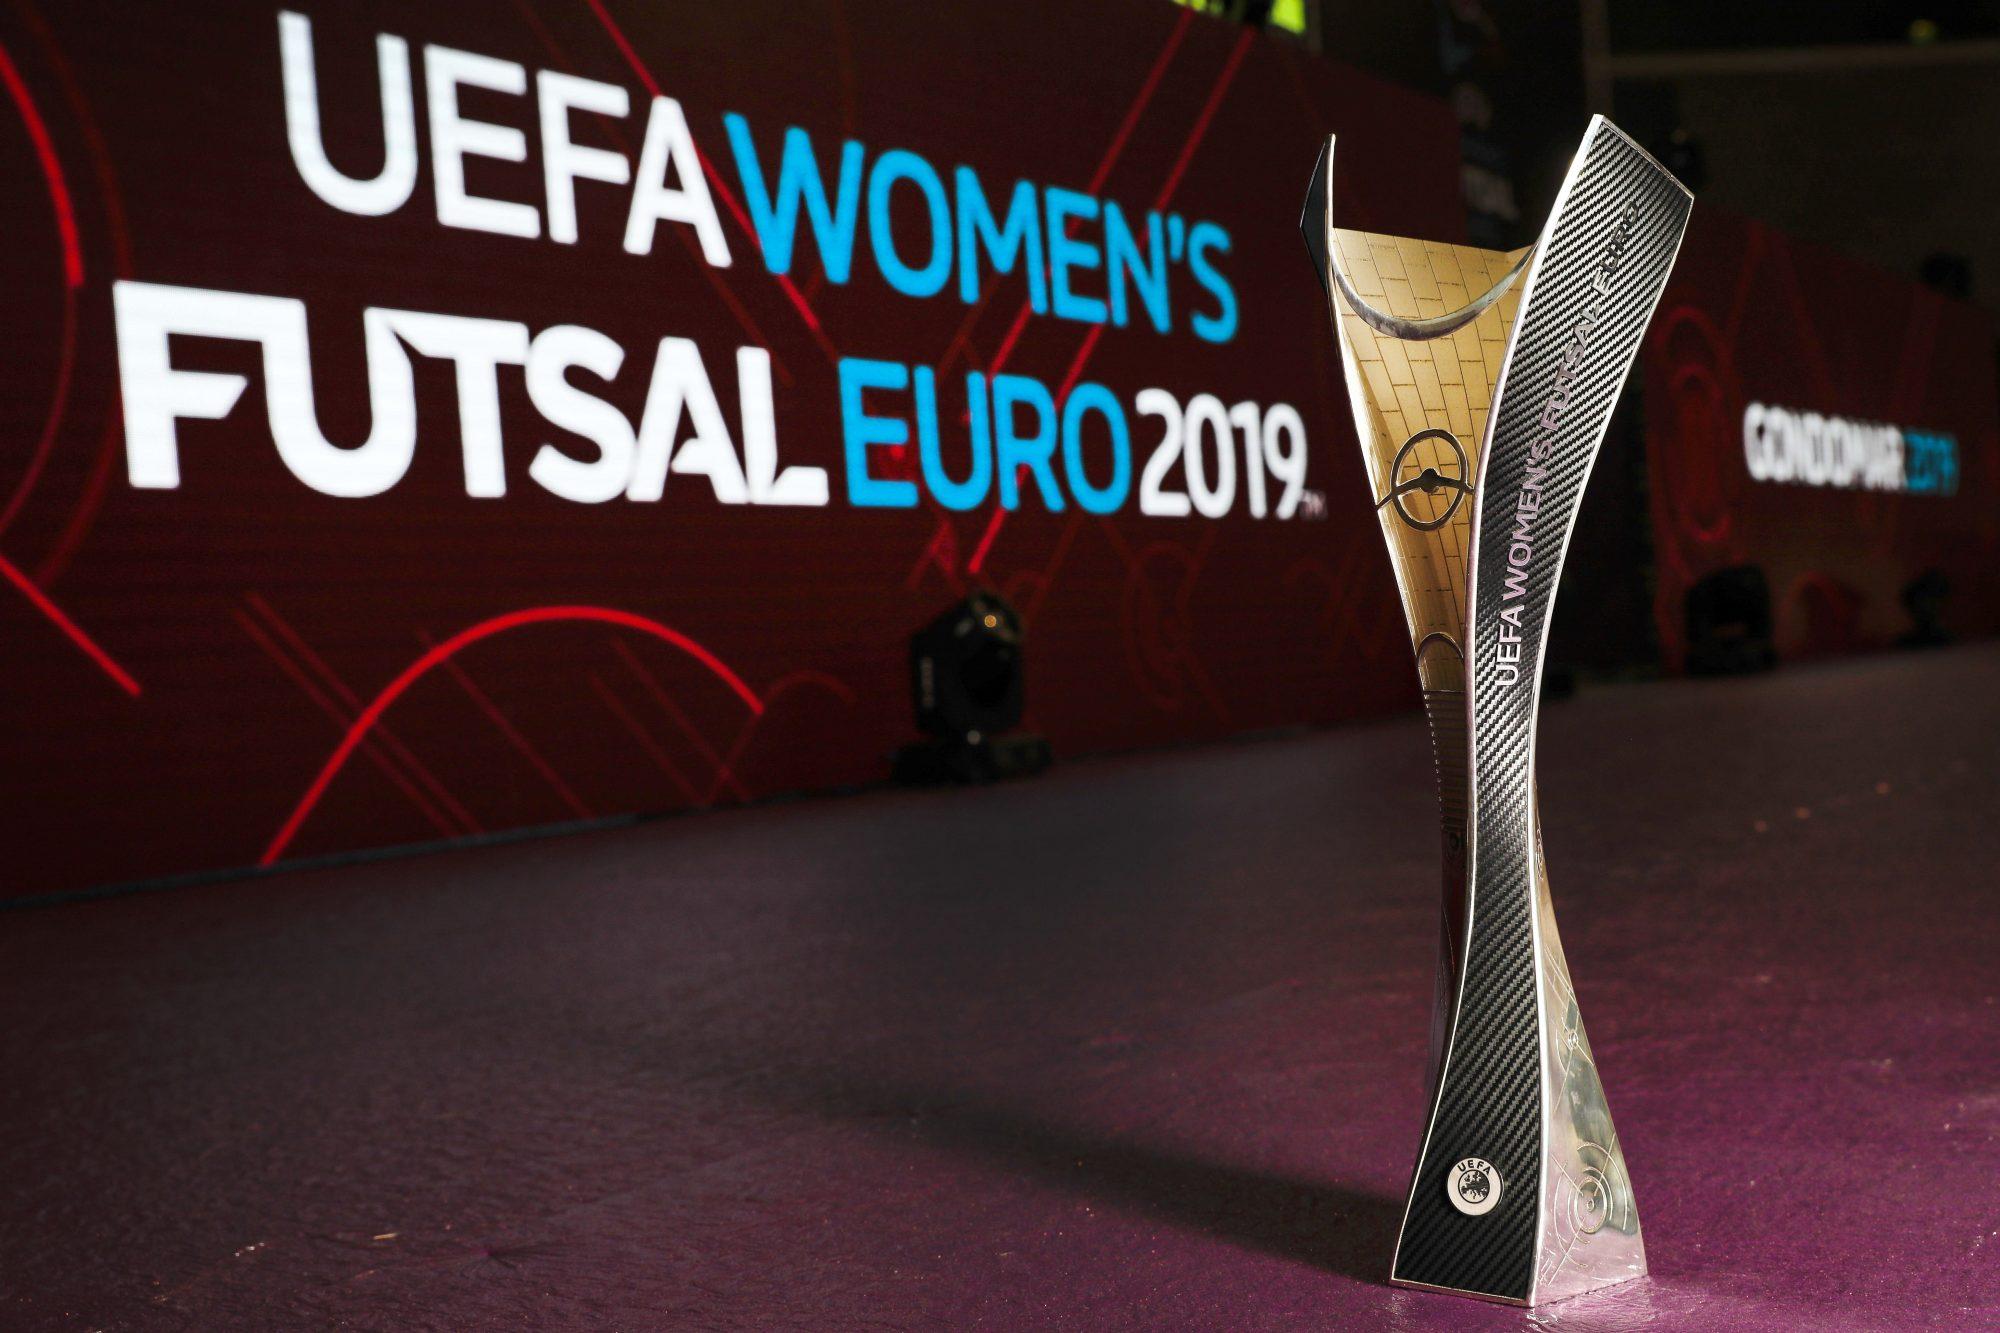 O primeiro Campeonato da Europa de Futsal Feminino realiza-se em Gondomar.